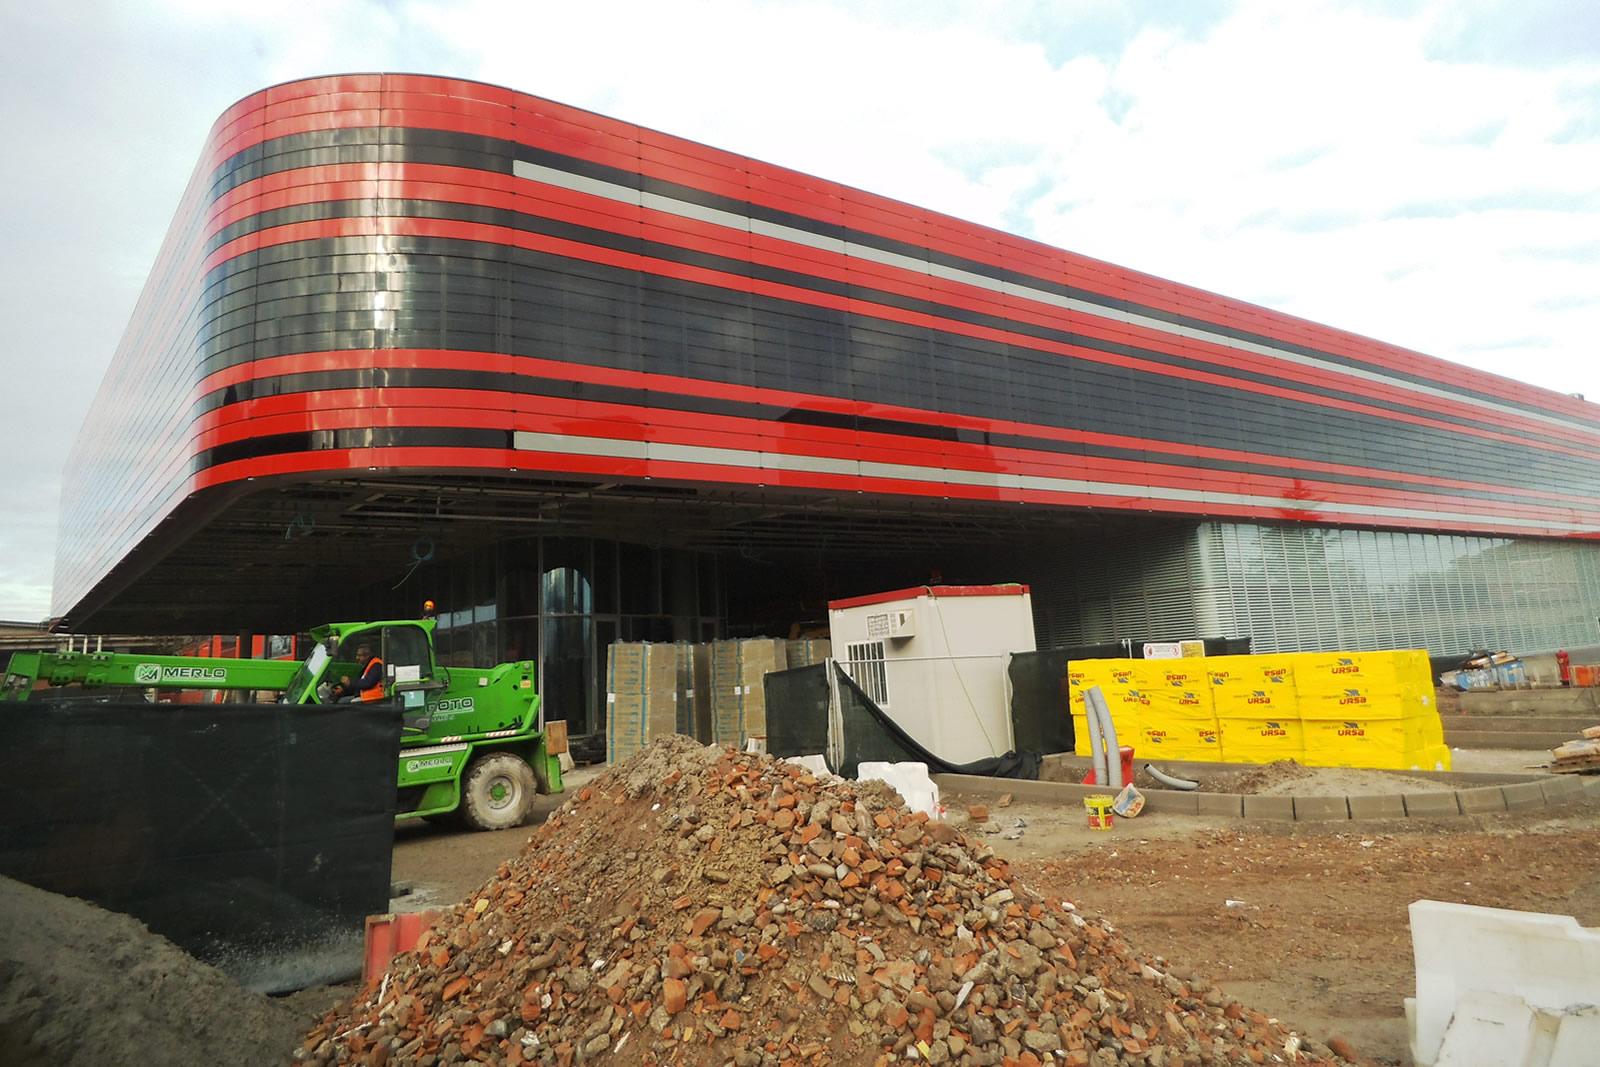 Ferrari ges building in Maranello